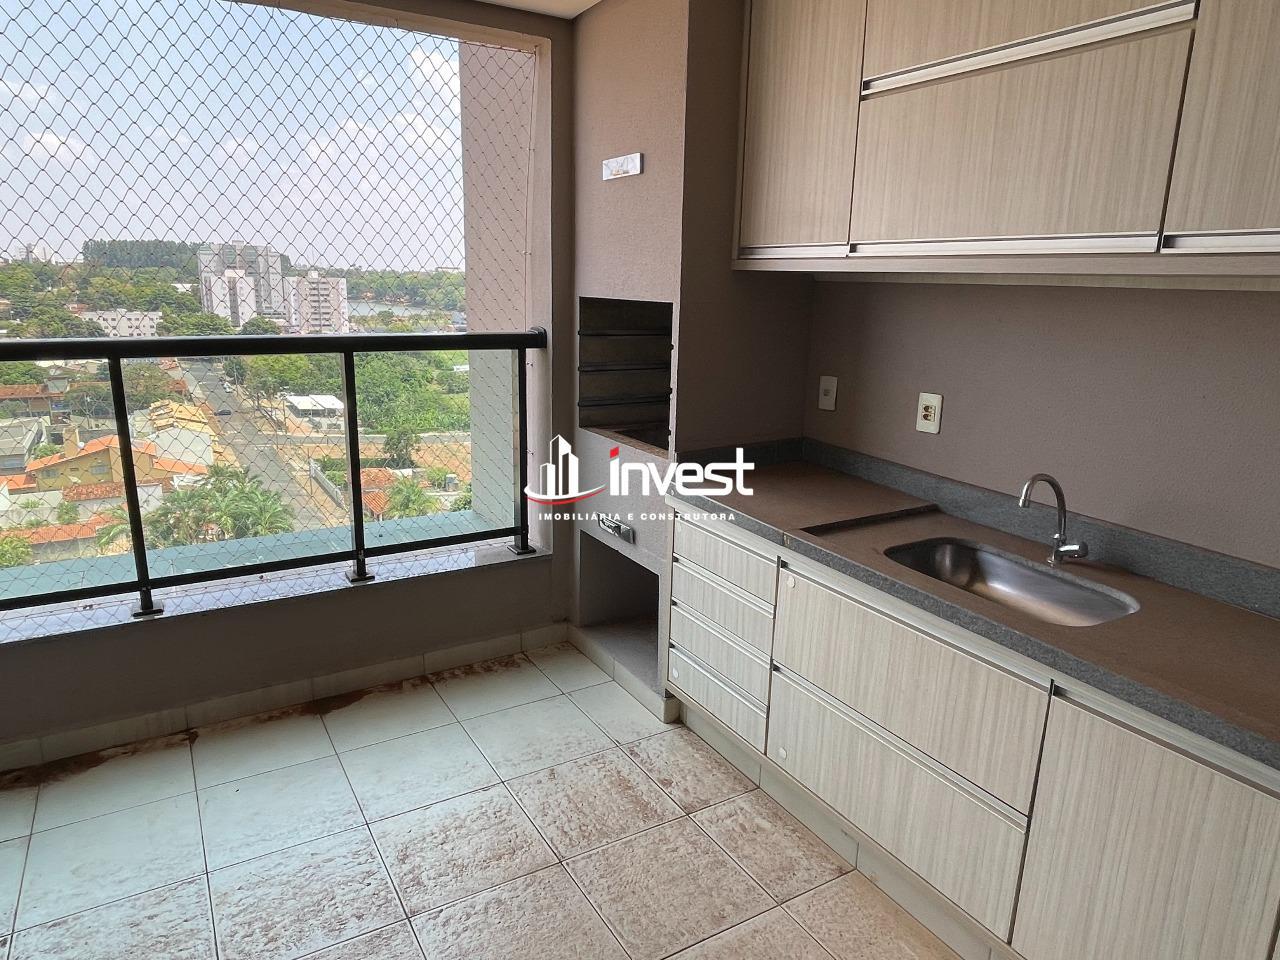 Apartamento à venda, 3 quartos, 3 suítes, 2 vagas, Santa Maria - Uberaba/MG